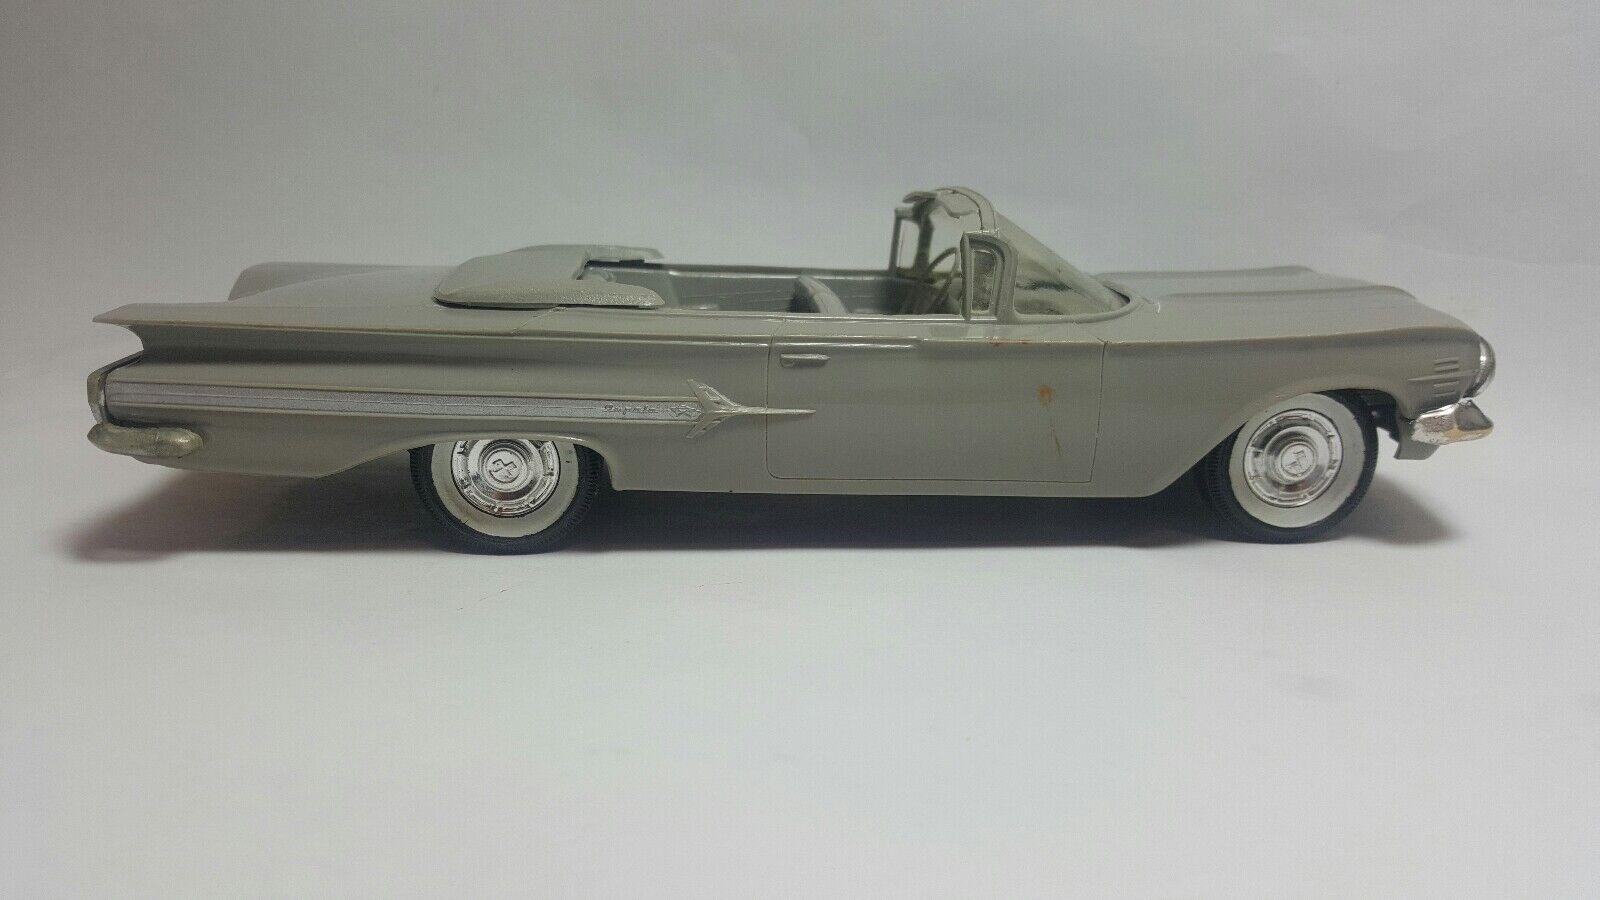 1960 Chevy Impala kongrönibla promo